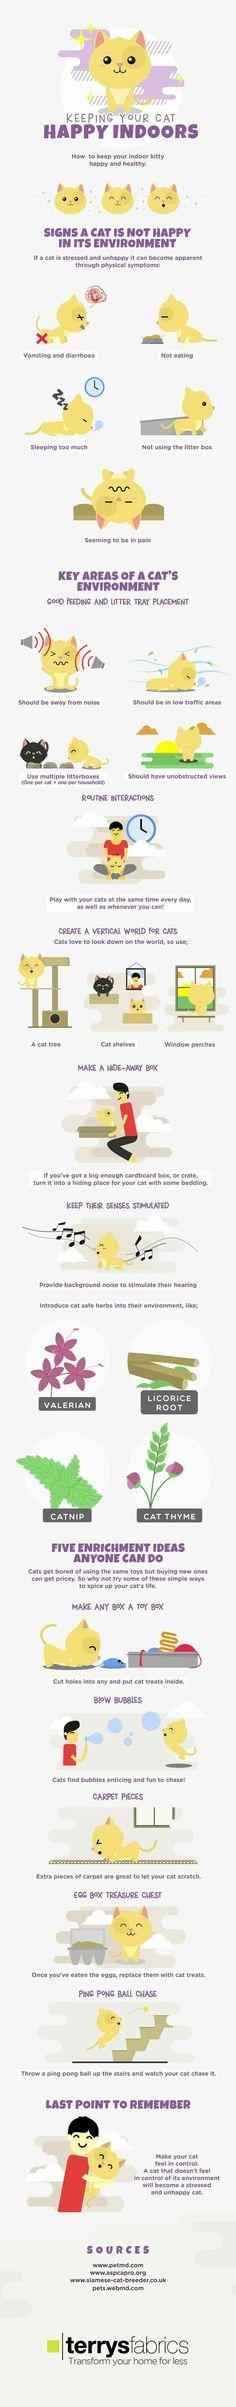 Cat Infographic: Keeping Your Inside Cat Happy! Diy Pour Chien, Catsu The Cat, Cat Hacks, Gatos Cats, Kitten Care, Cat Care Tips, Cat Behavior, Cat Health, Health Tips